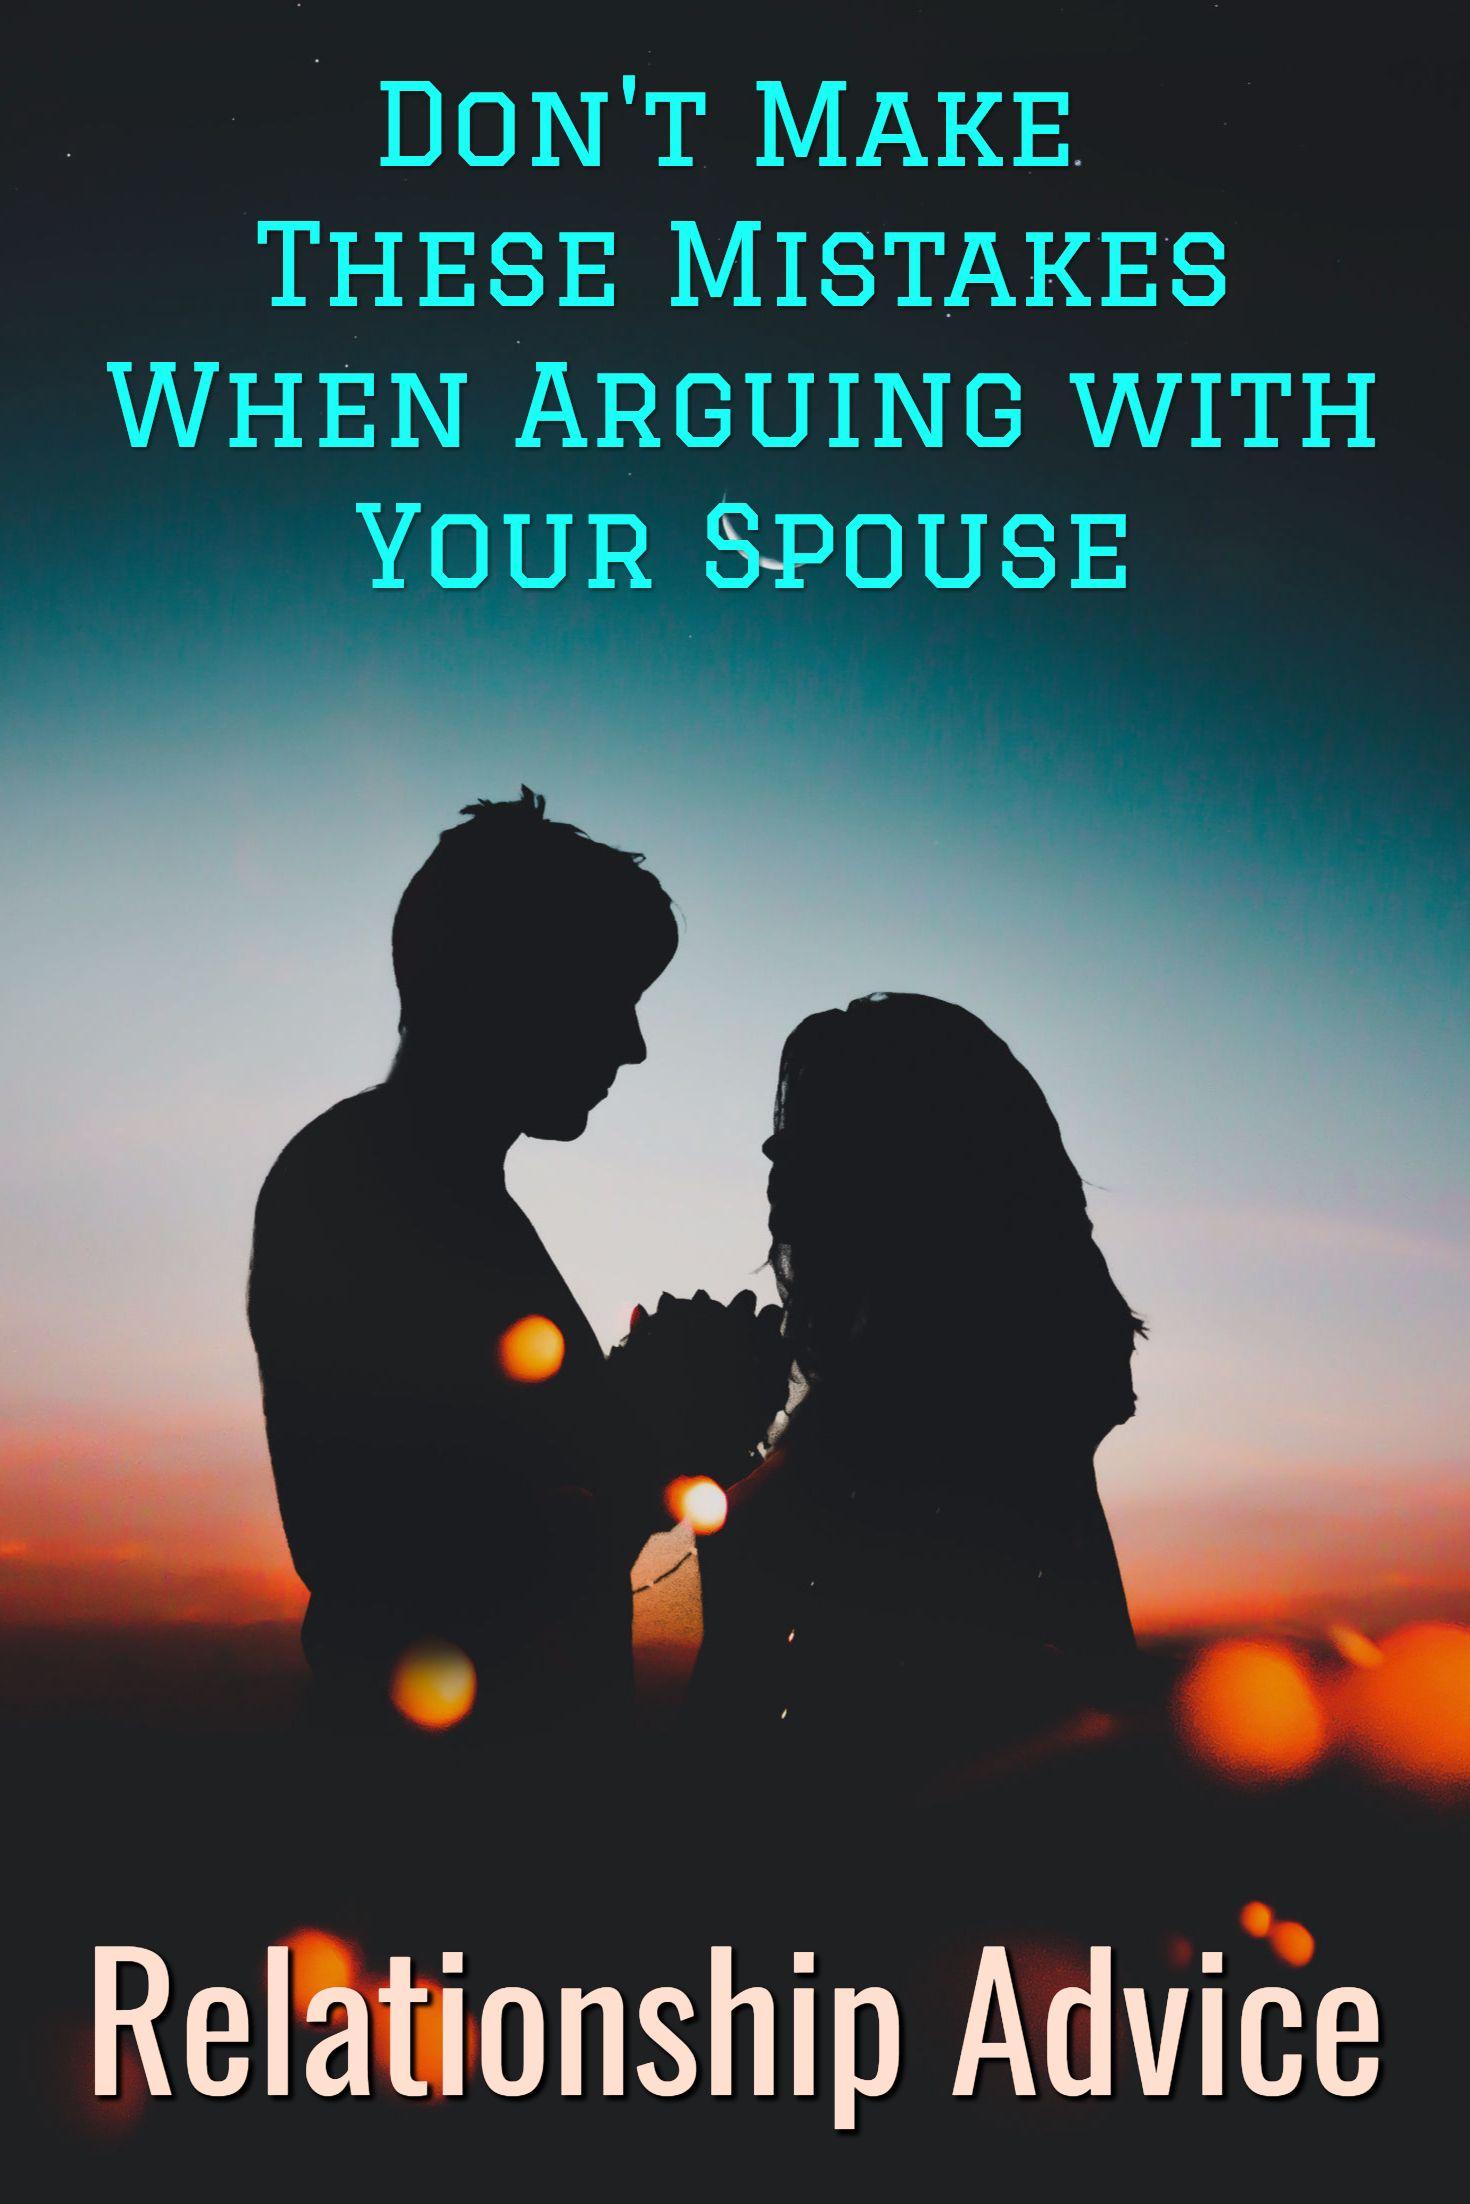 Understanding dating relationships michael rosenbaum dating